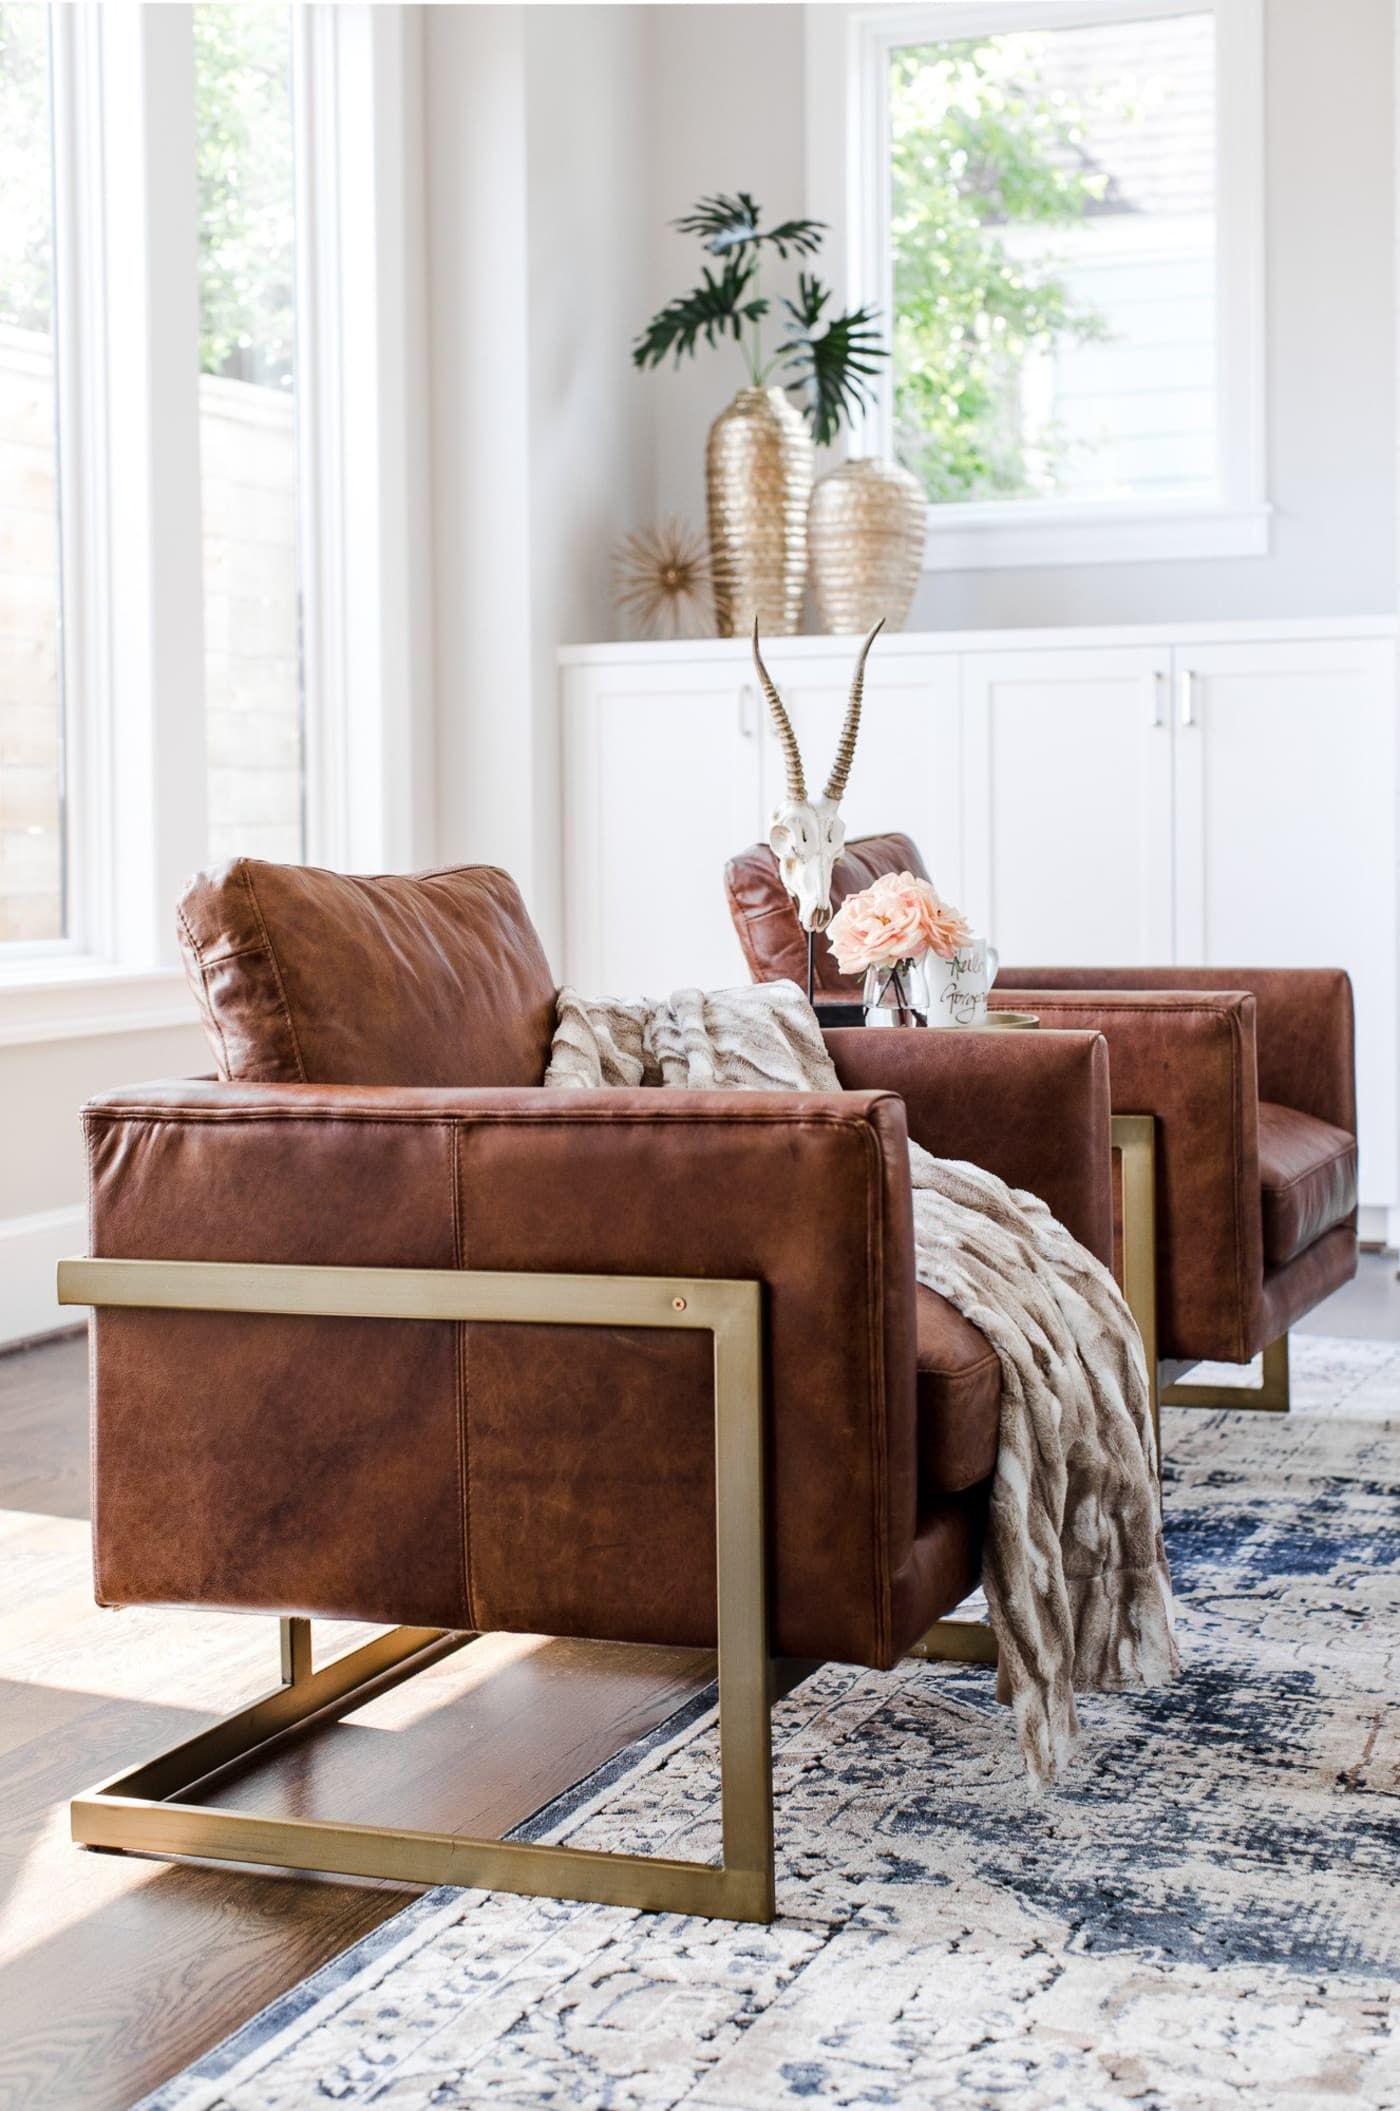 Best Edloe Finch London Cognac Leather Accent Chair Reviews 400 x 300